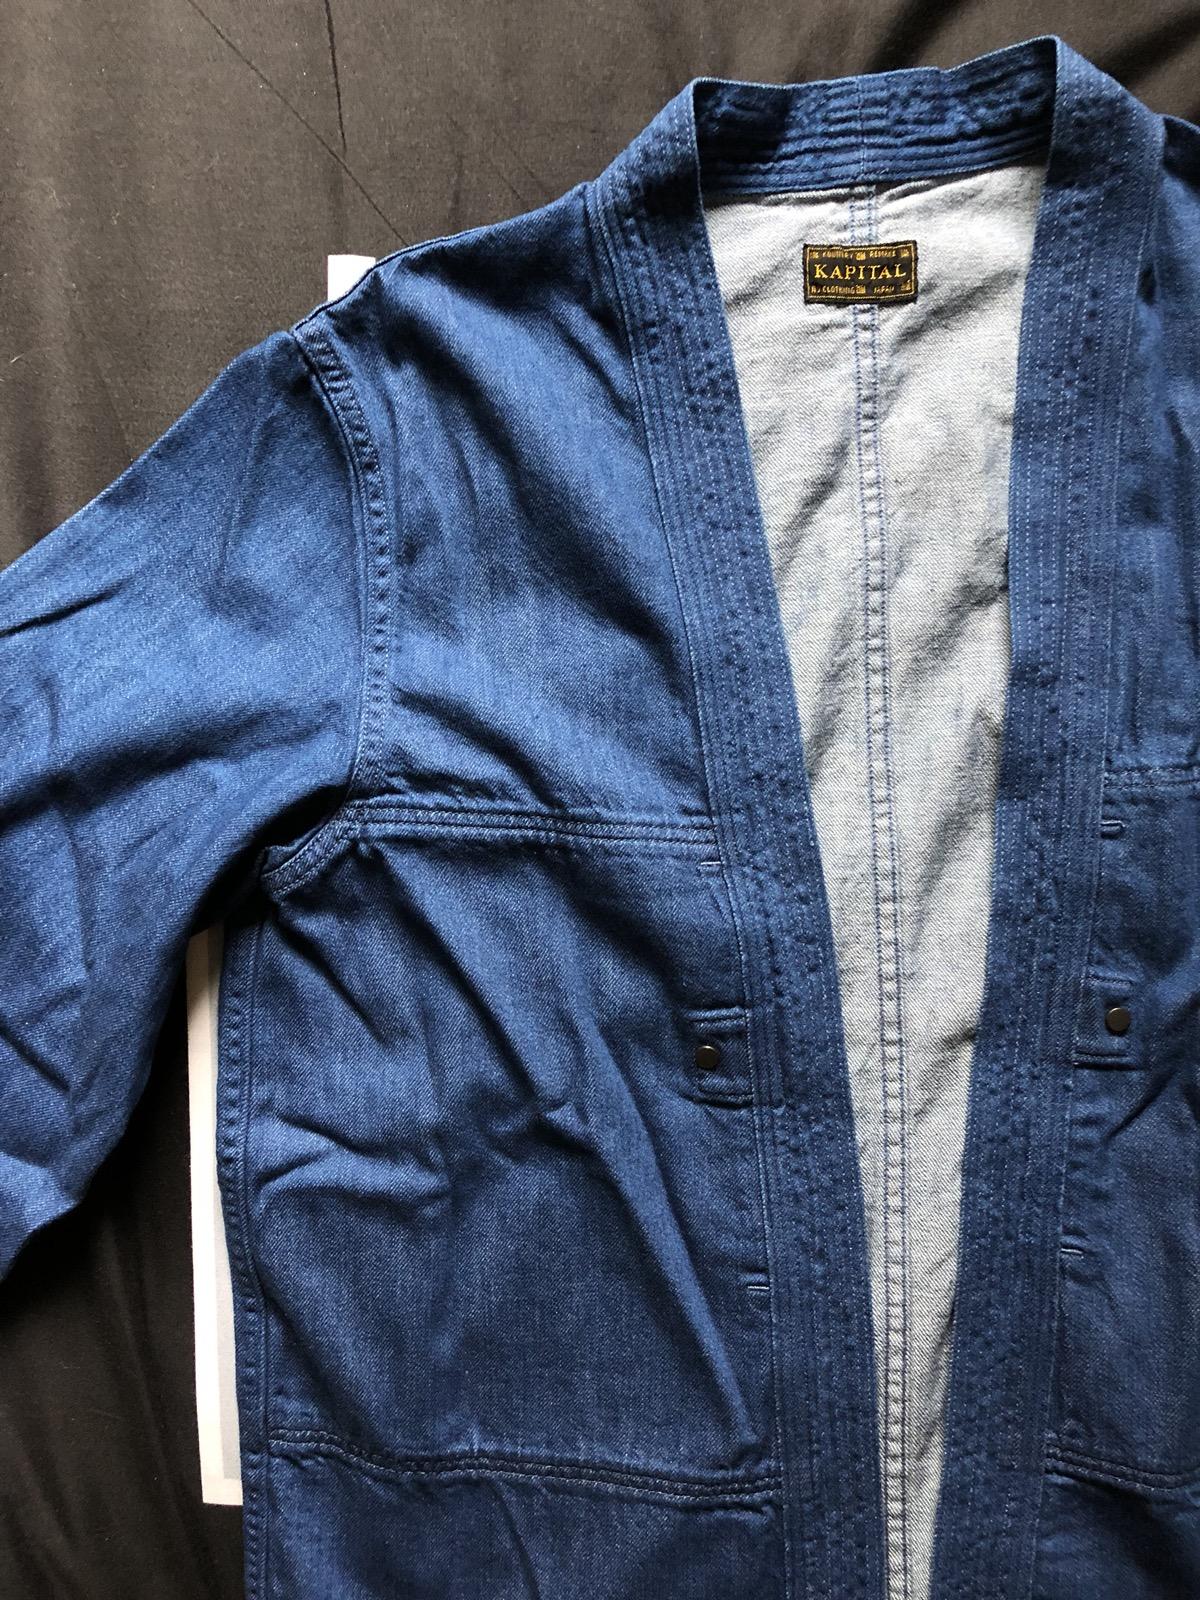 e8f75877654 Kapital 8oz Denim Aviator Kakashi Shirt Indigo Final Drop